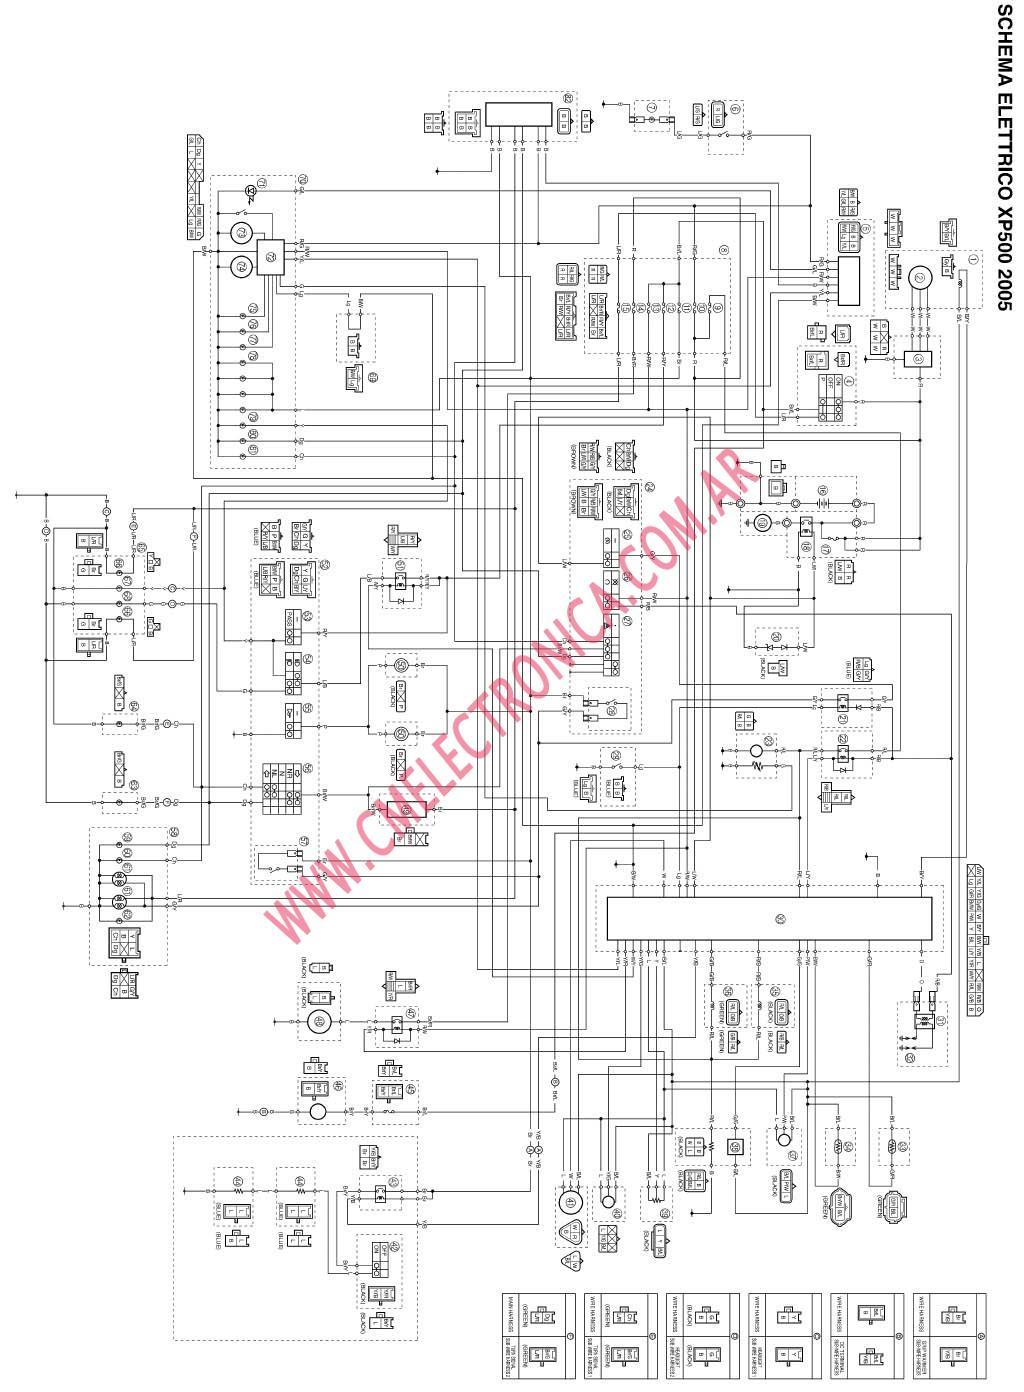 Chevy Truck Wiring Diagram Besides 1977 Honda Goldwing Wiring Diagram